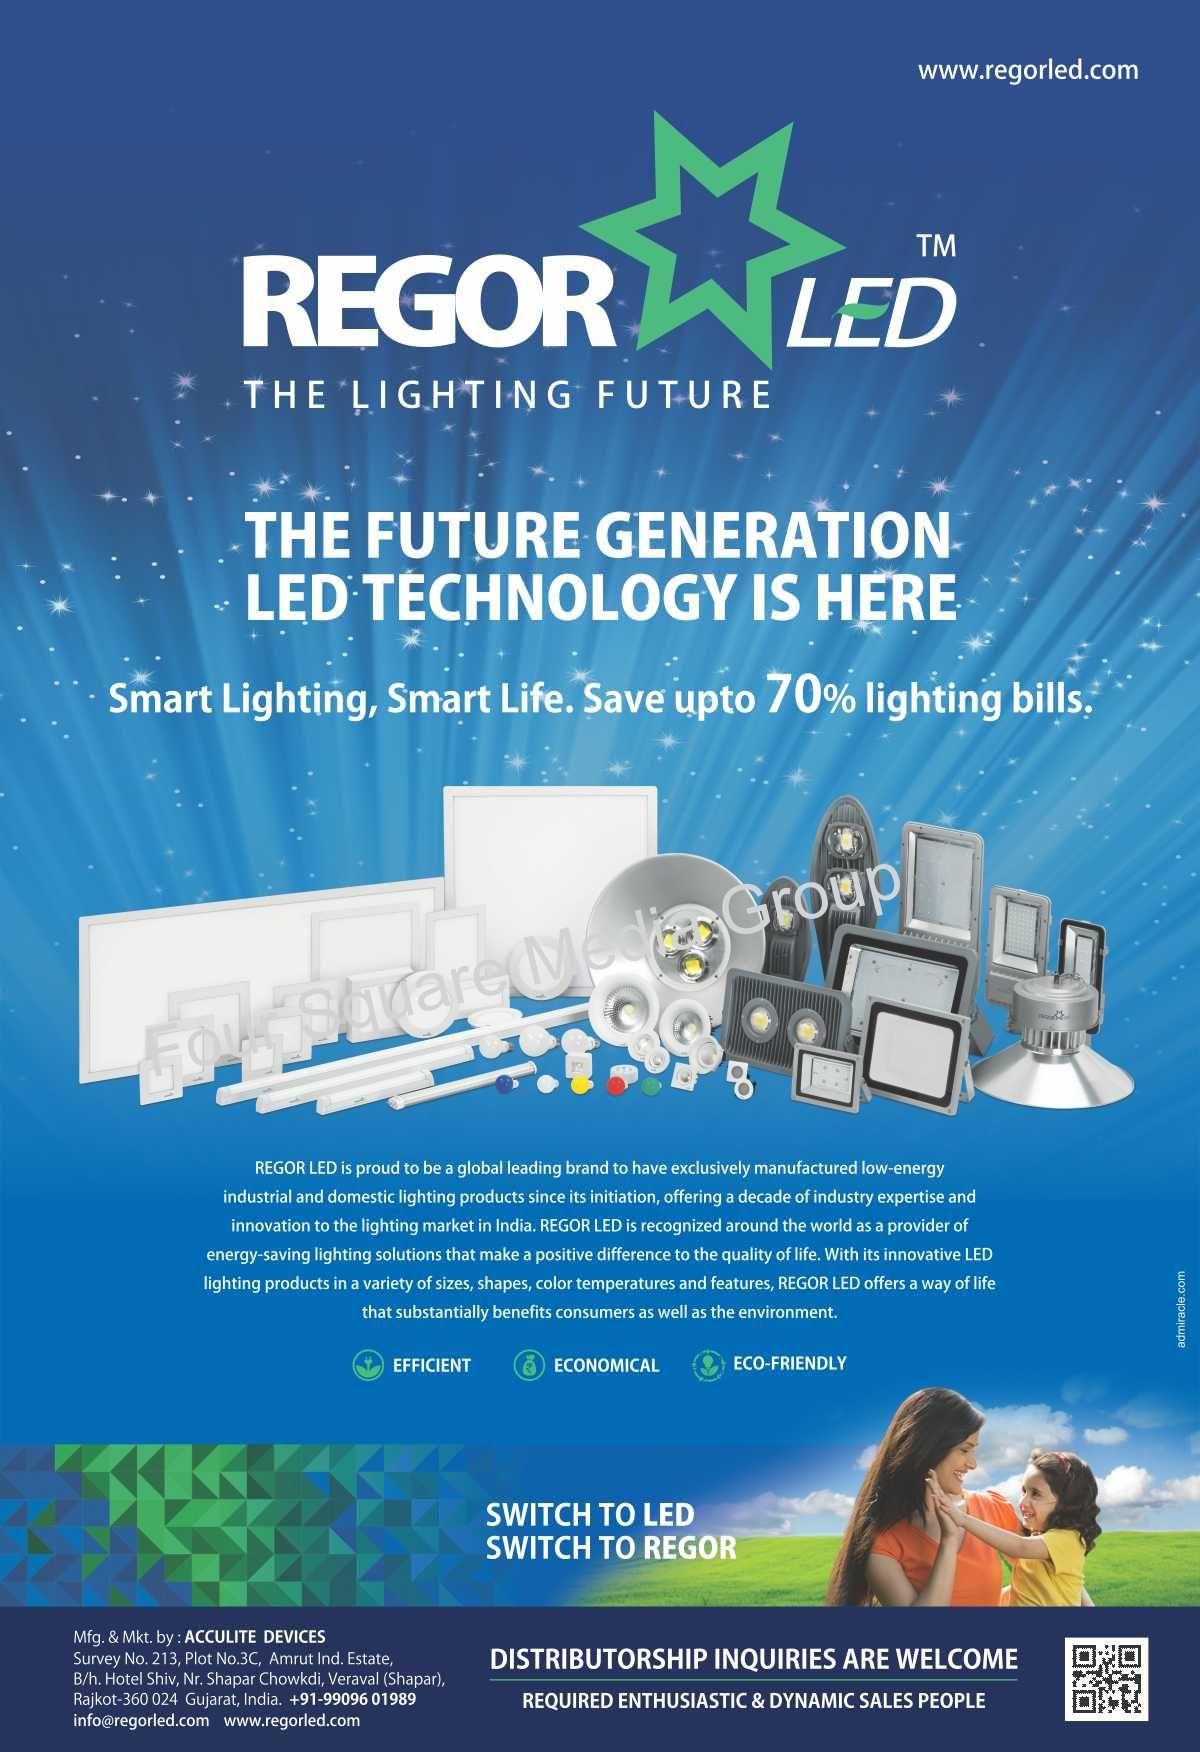 acculite devices rajkot 360024 gujarat led ledlighting led